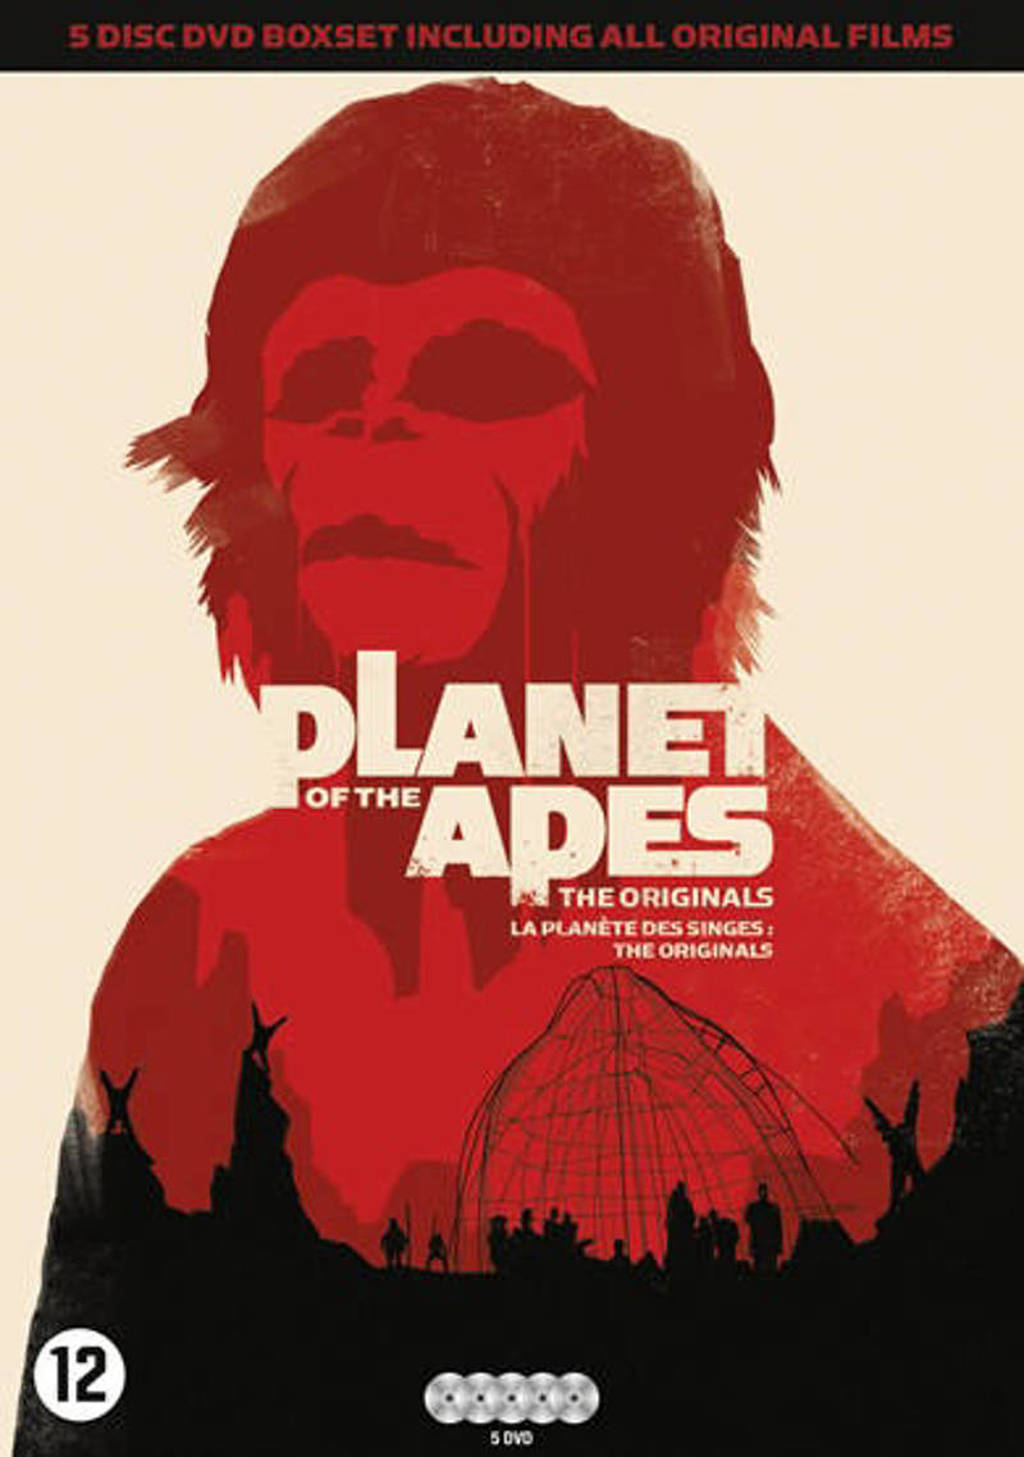 Planet of the apes - The originals (DVD)